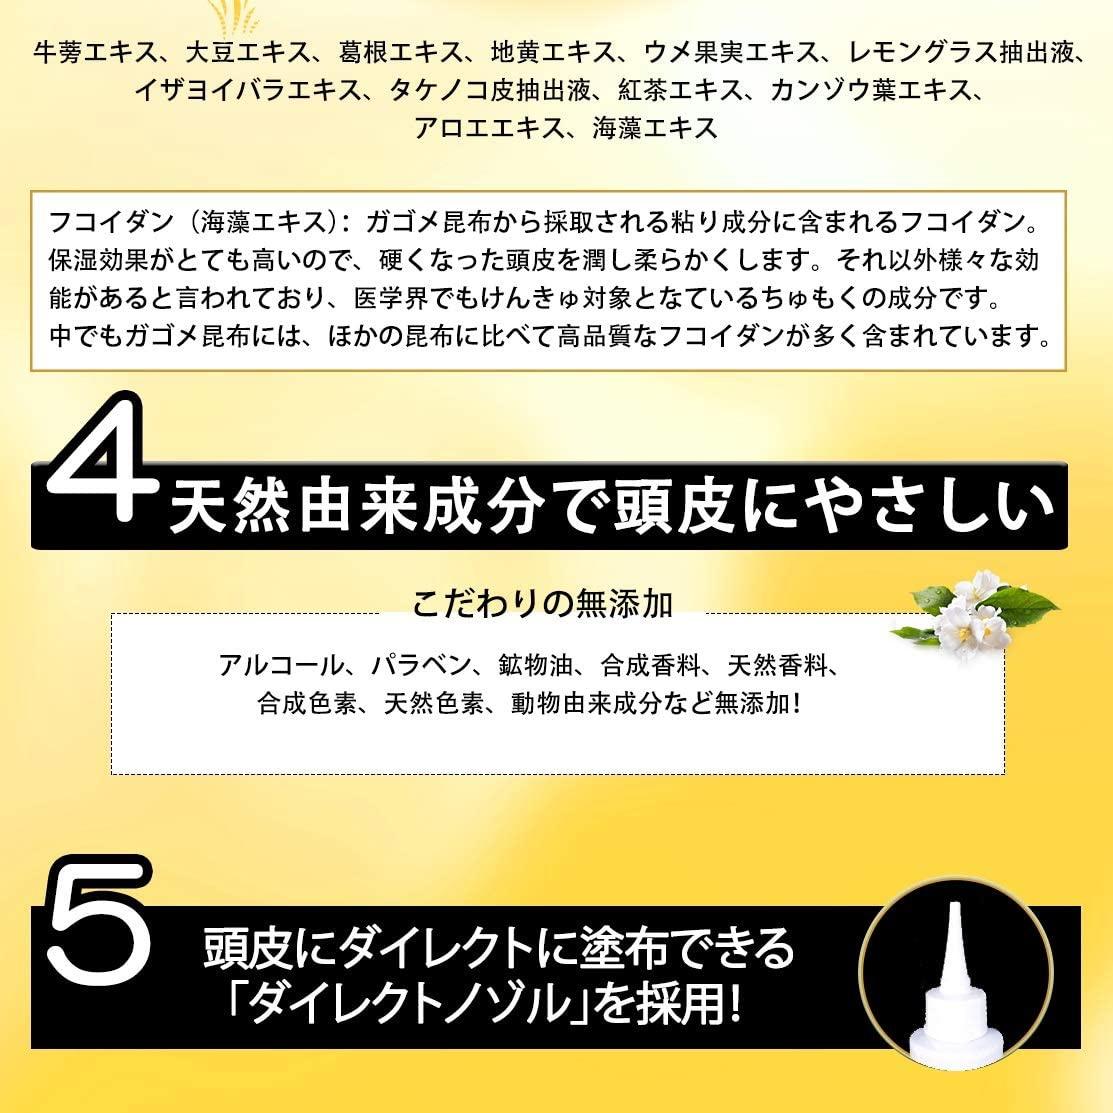 SPRING(スプリング) 薬用 育毛 エッセンスの商品画像8